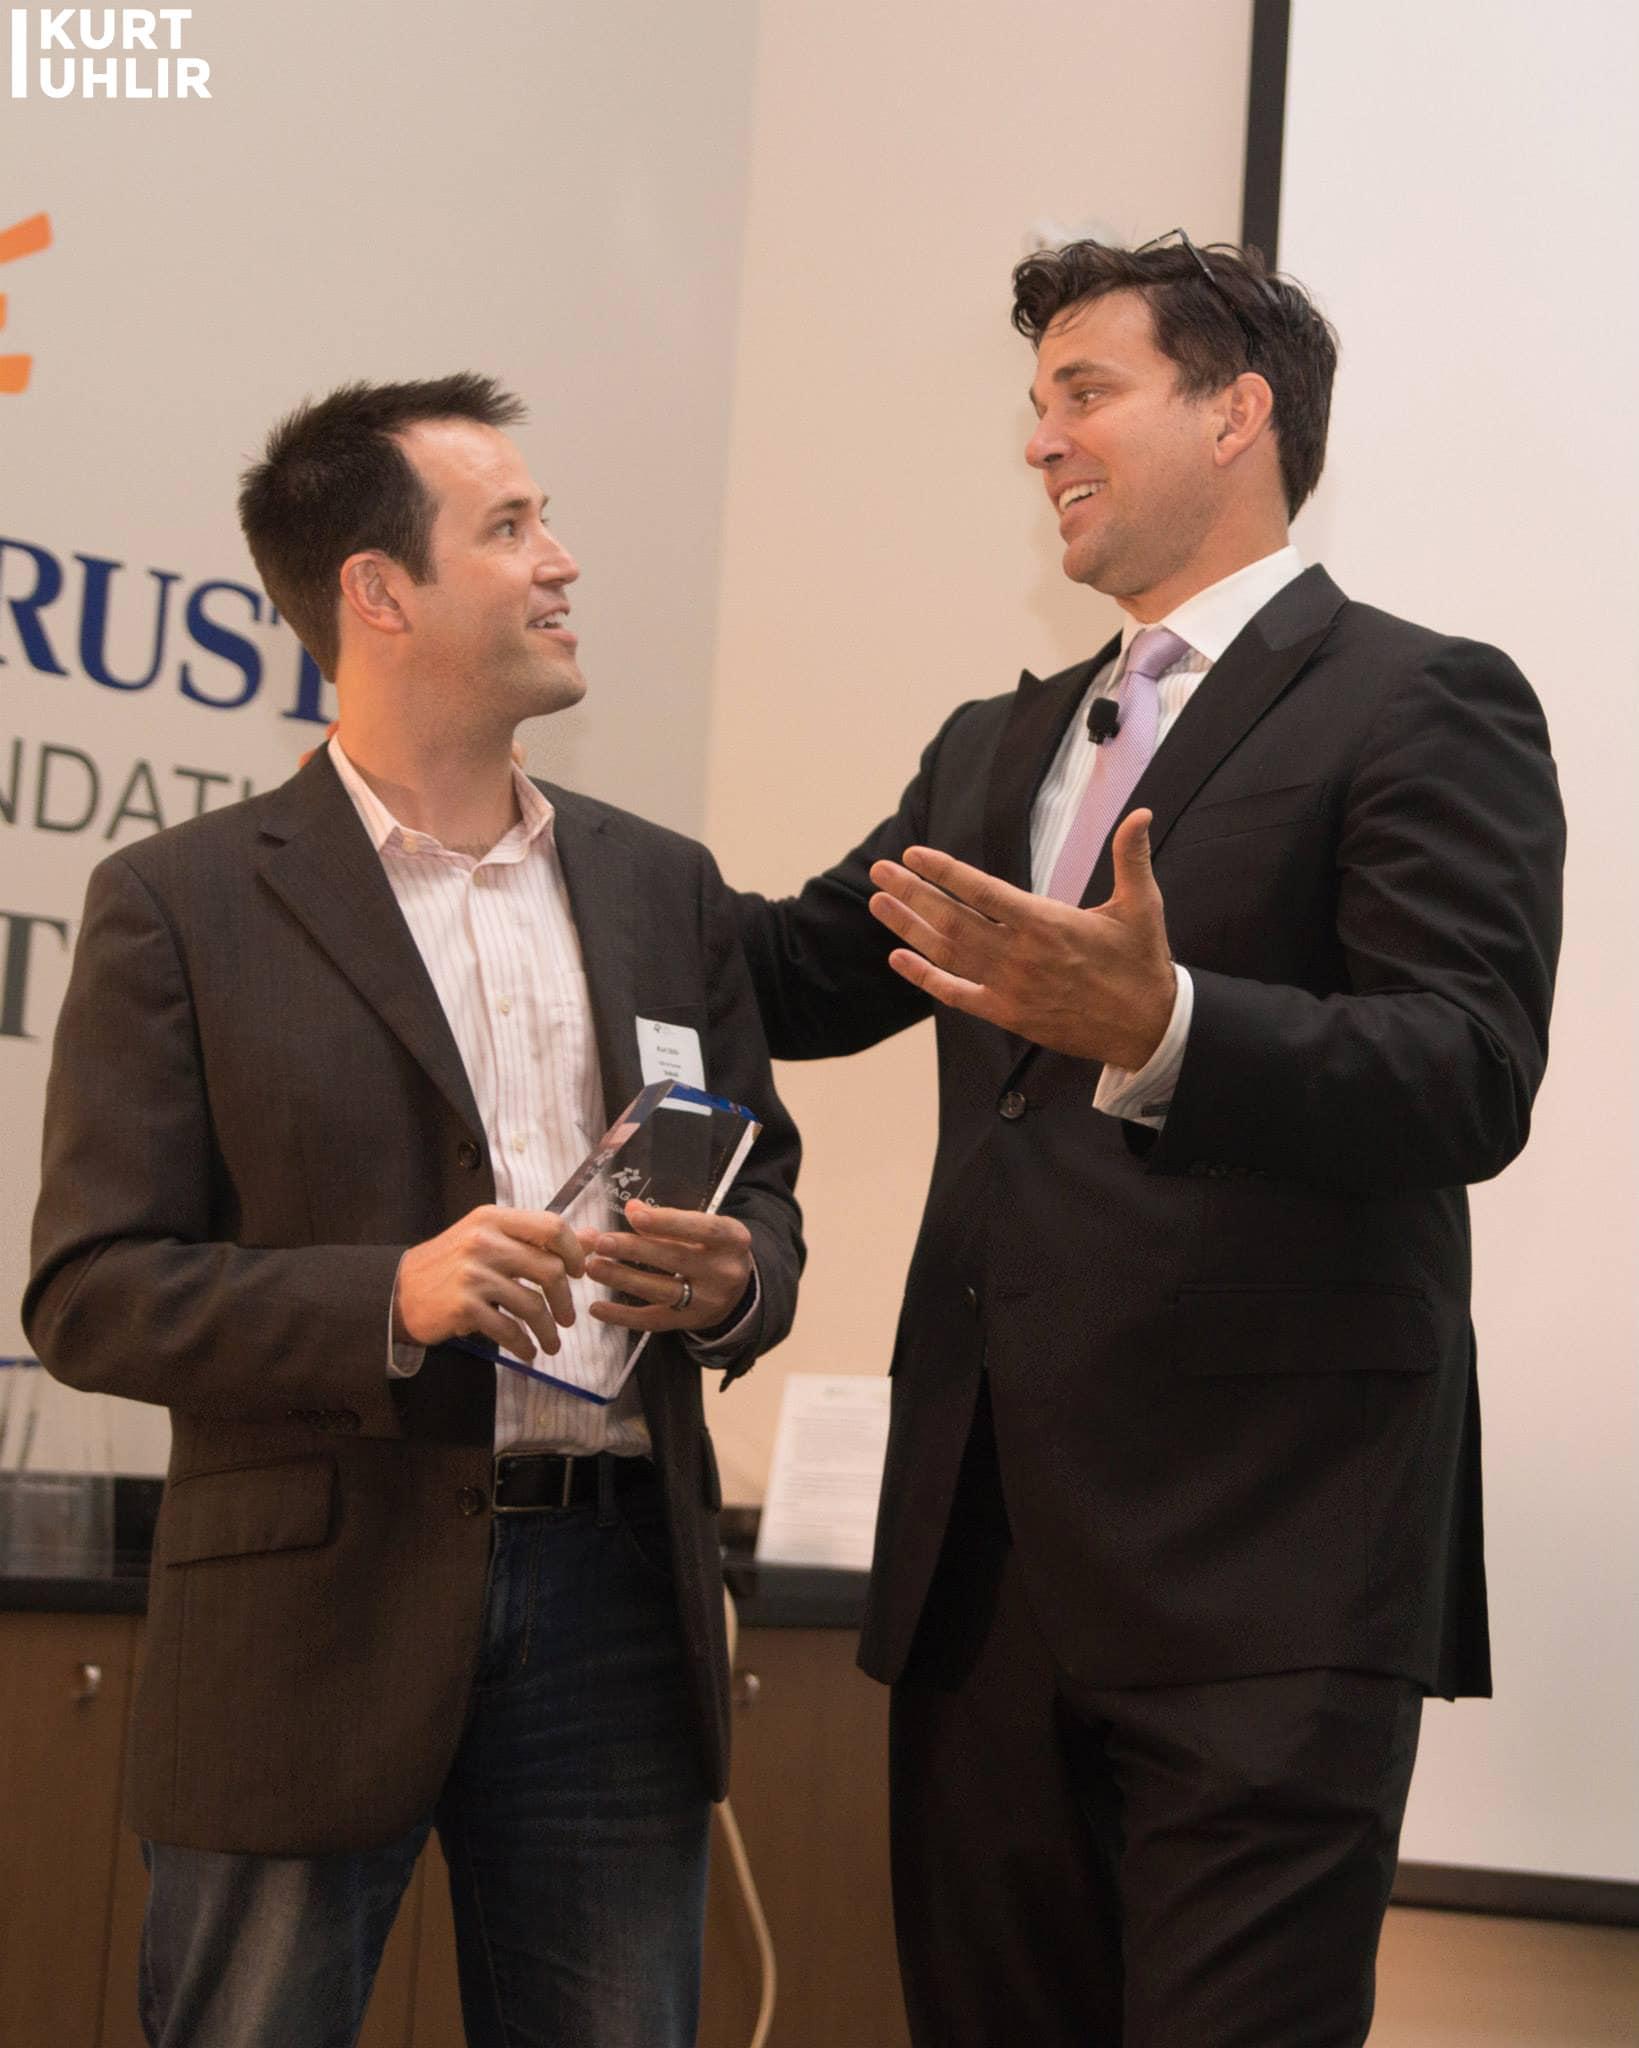 Kurt Uhlir with Conn Jackson. After accepting award for Sideqik leading the evolution of partnership marketing into influencer marketing. 2014 TAG Social Savvy Awards - Technology Association of Georgia